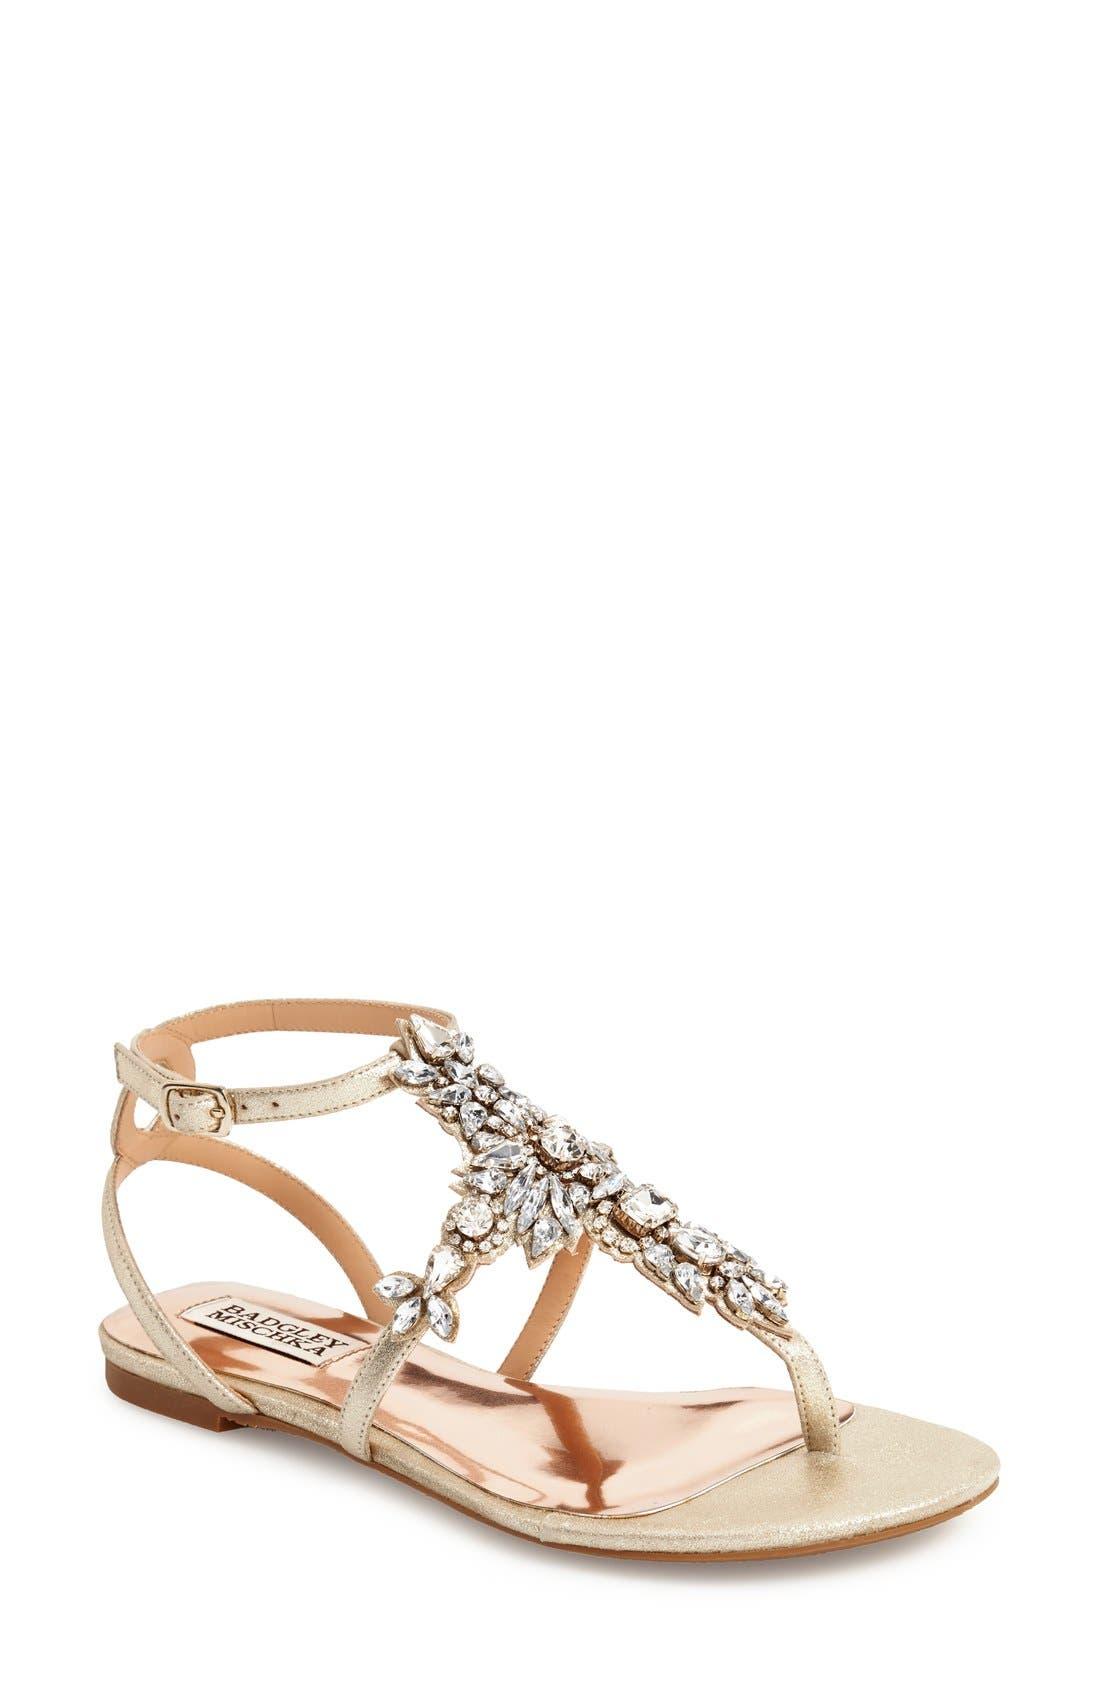 Alternate Image 1 Selected - Badgley Mischka 'Cara' Crystal Embellished Flat Sandal (Women)